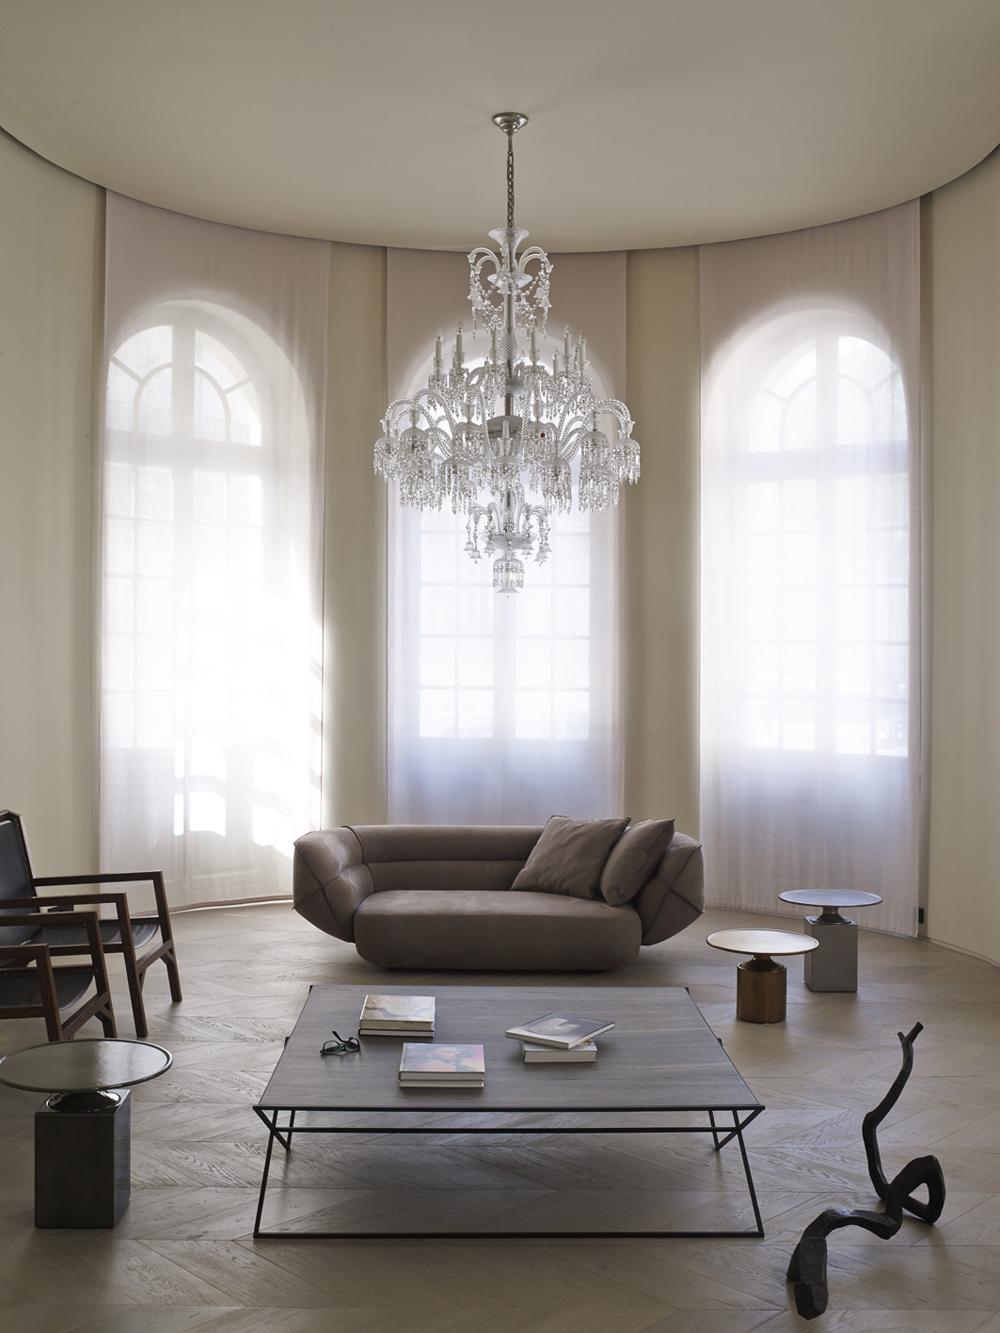 christophe-delcourt-interior-inspiration-3.jpg